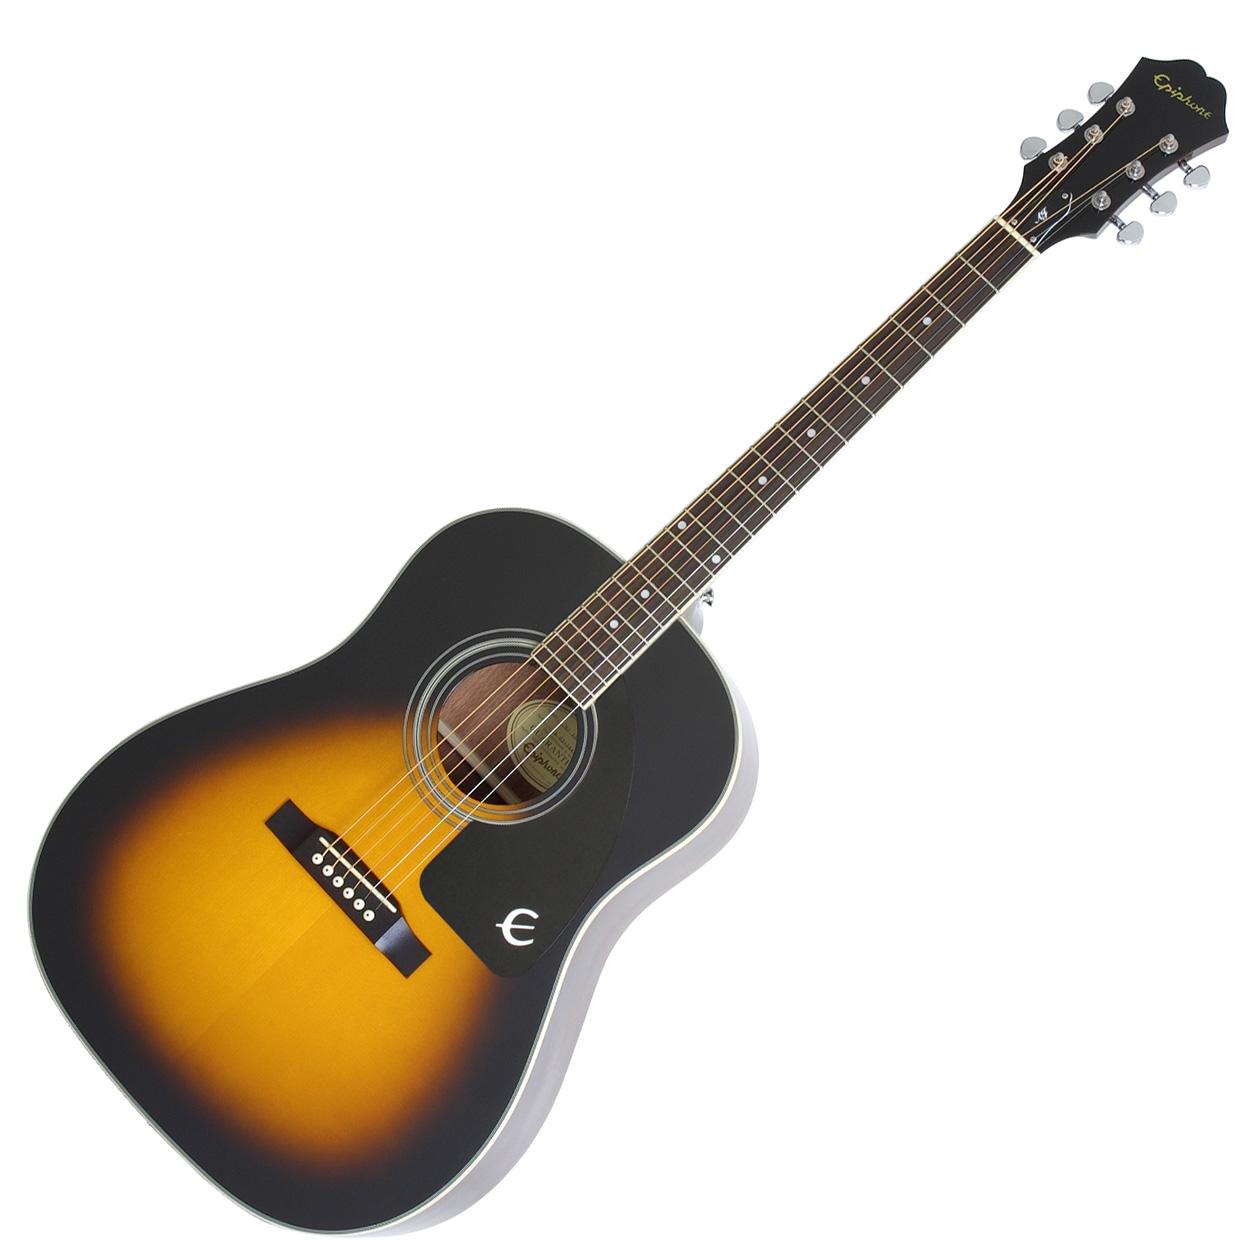 Gitara akustyczna Epiphone AJ-100